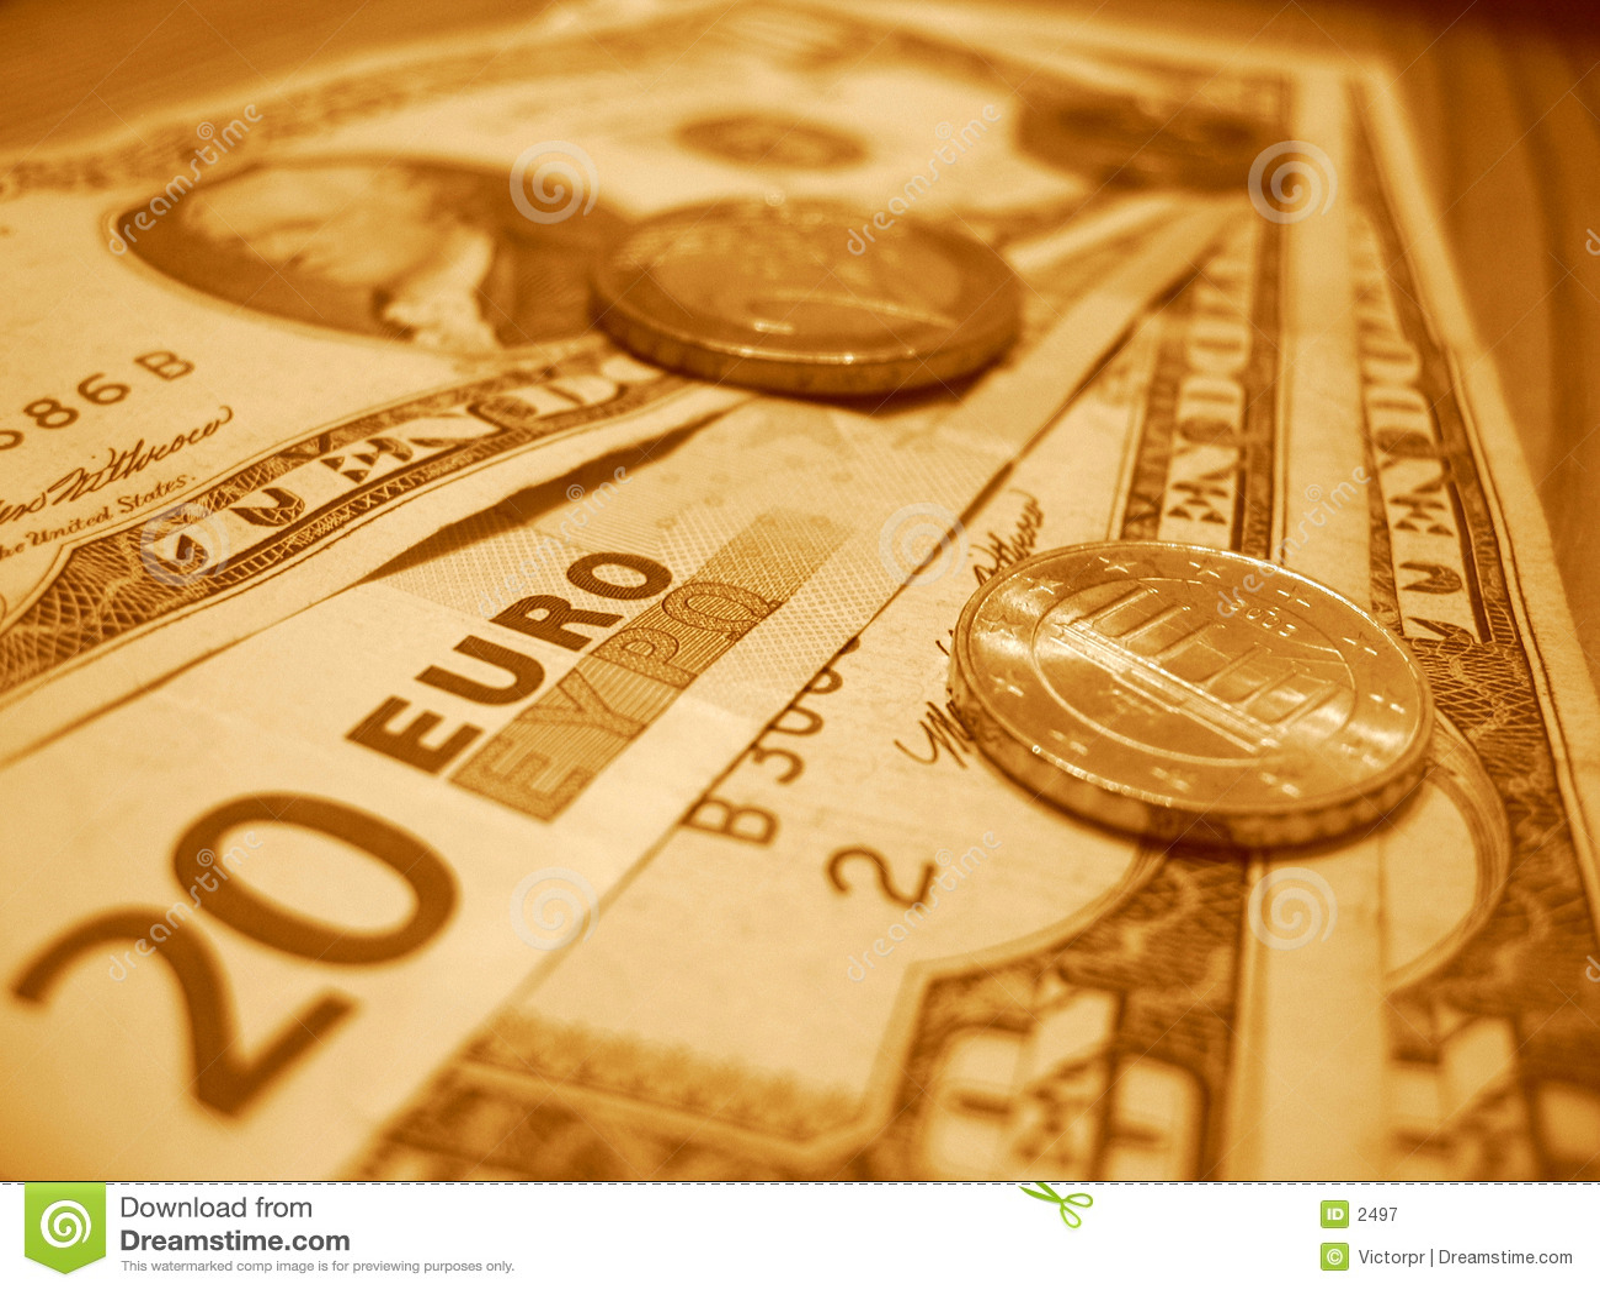 Veinte euros y diez dólares